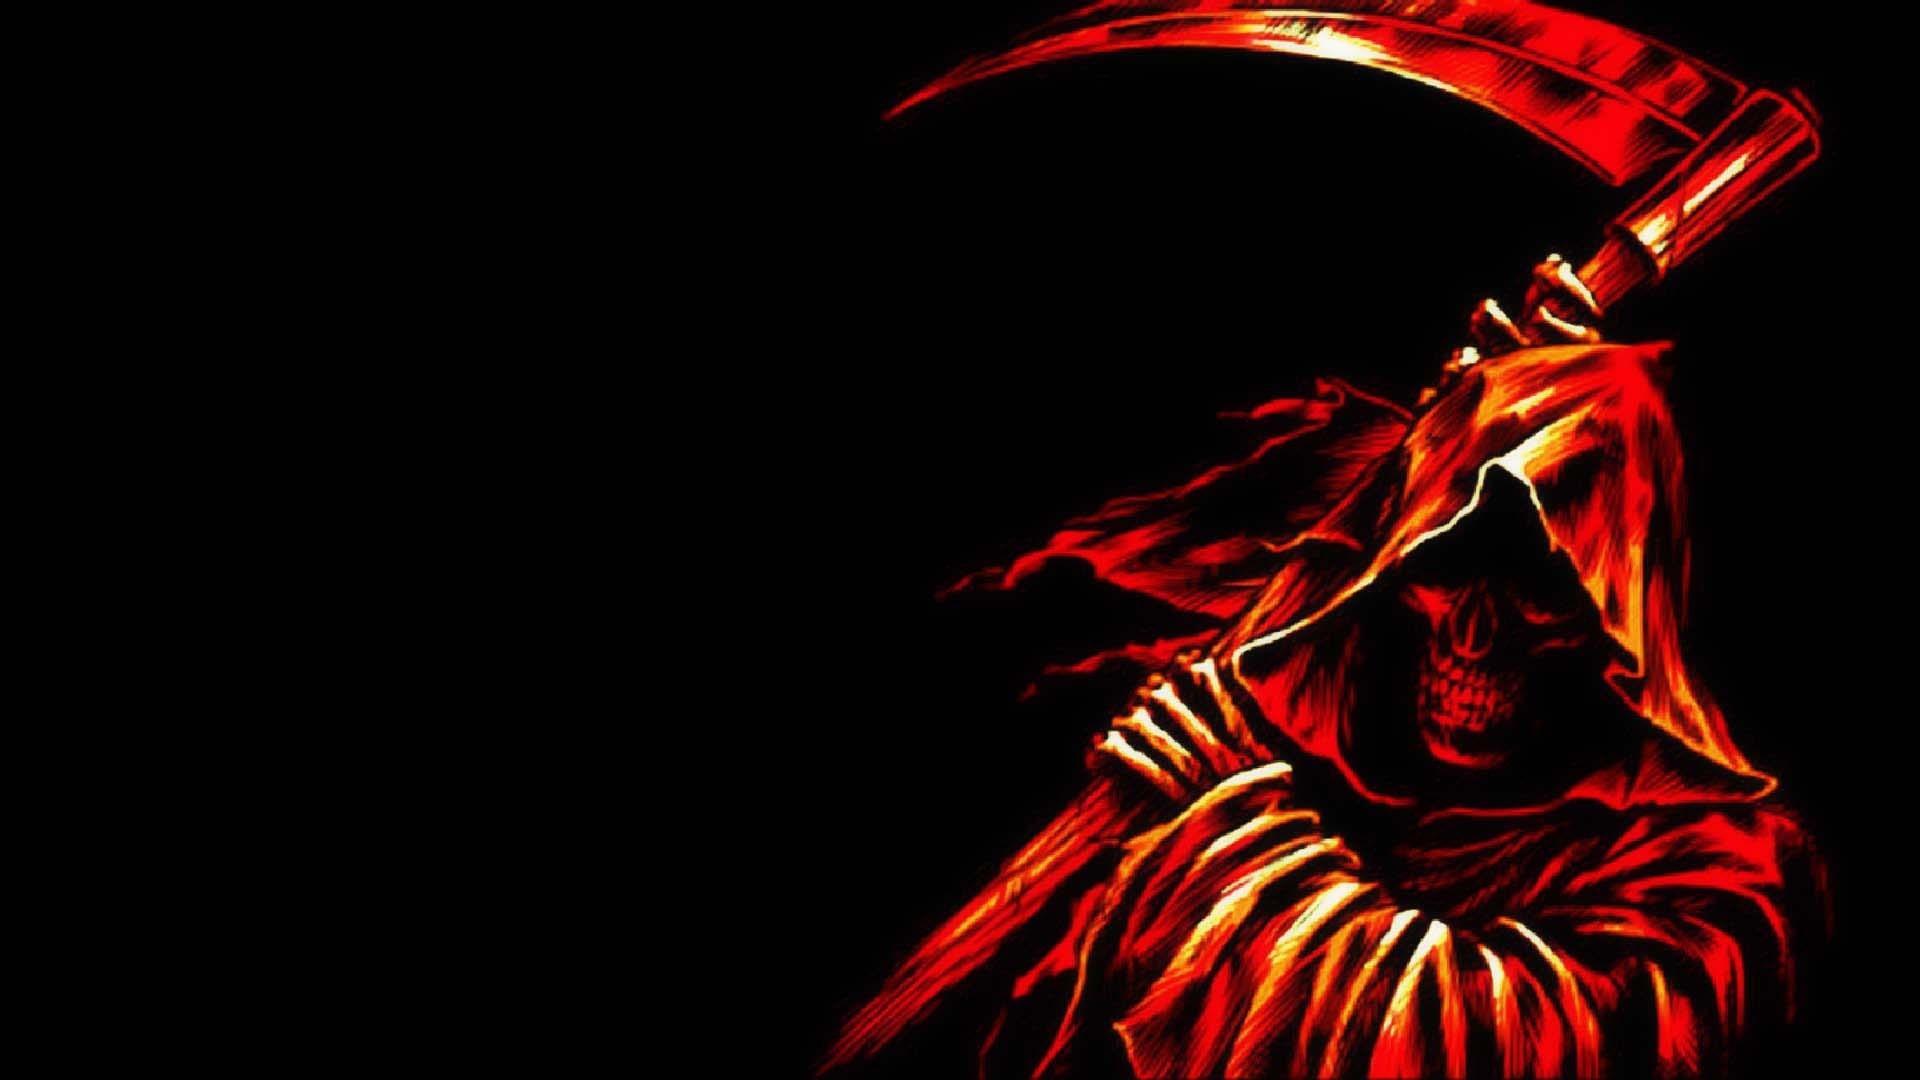 Grim reaper backgrounds 68 images - Reaper wallpaper ...